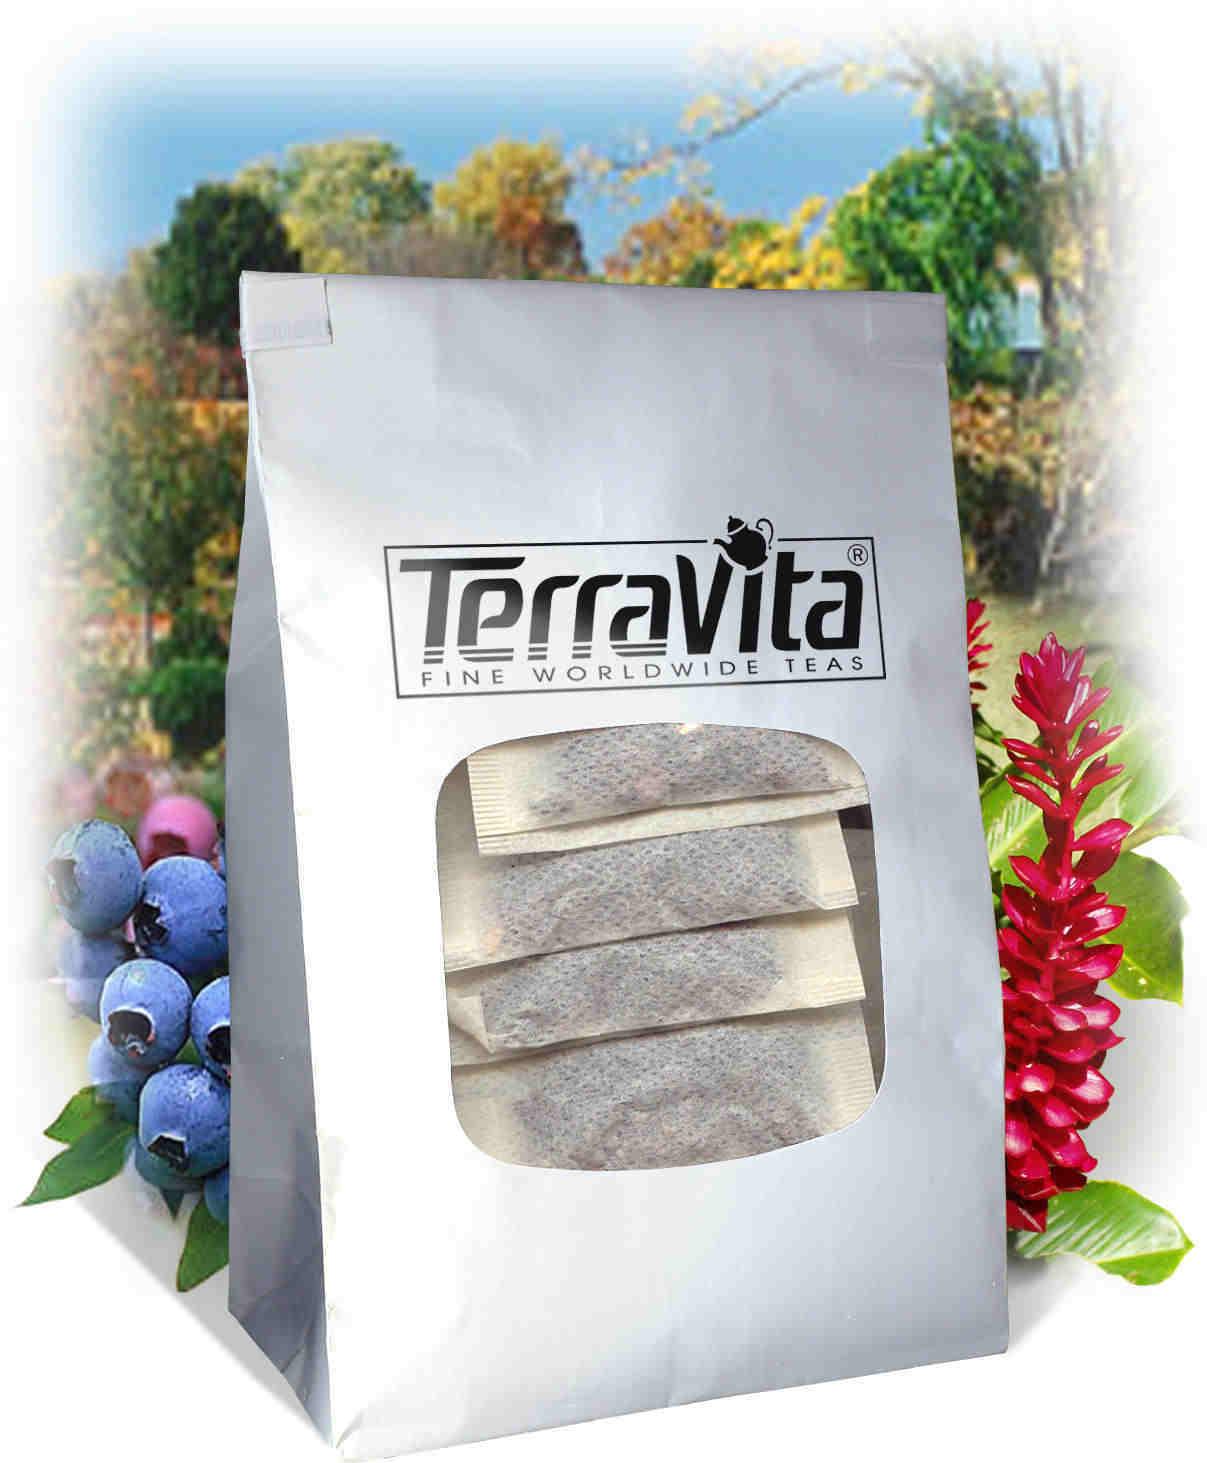 Spearmint Leaf (Certified Organic) Tea